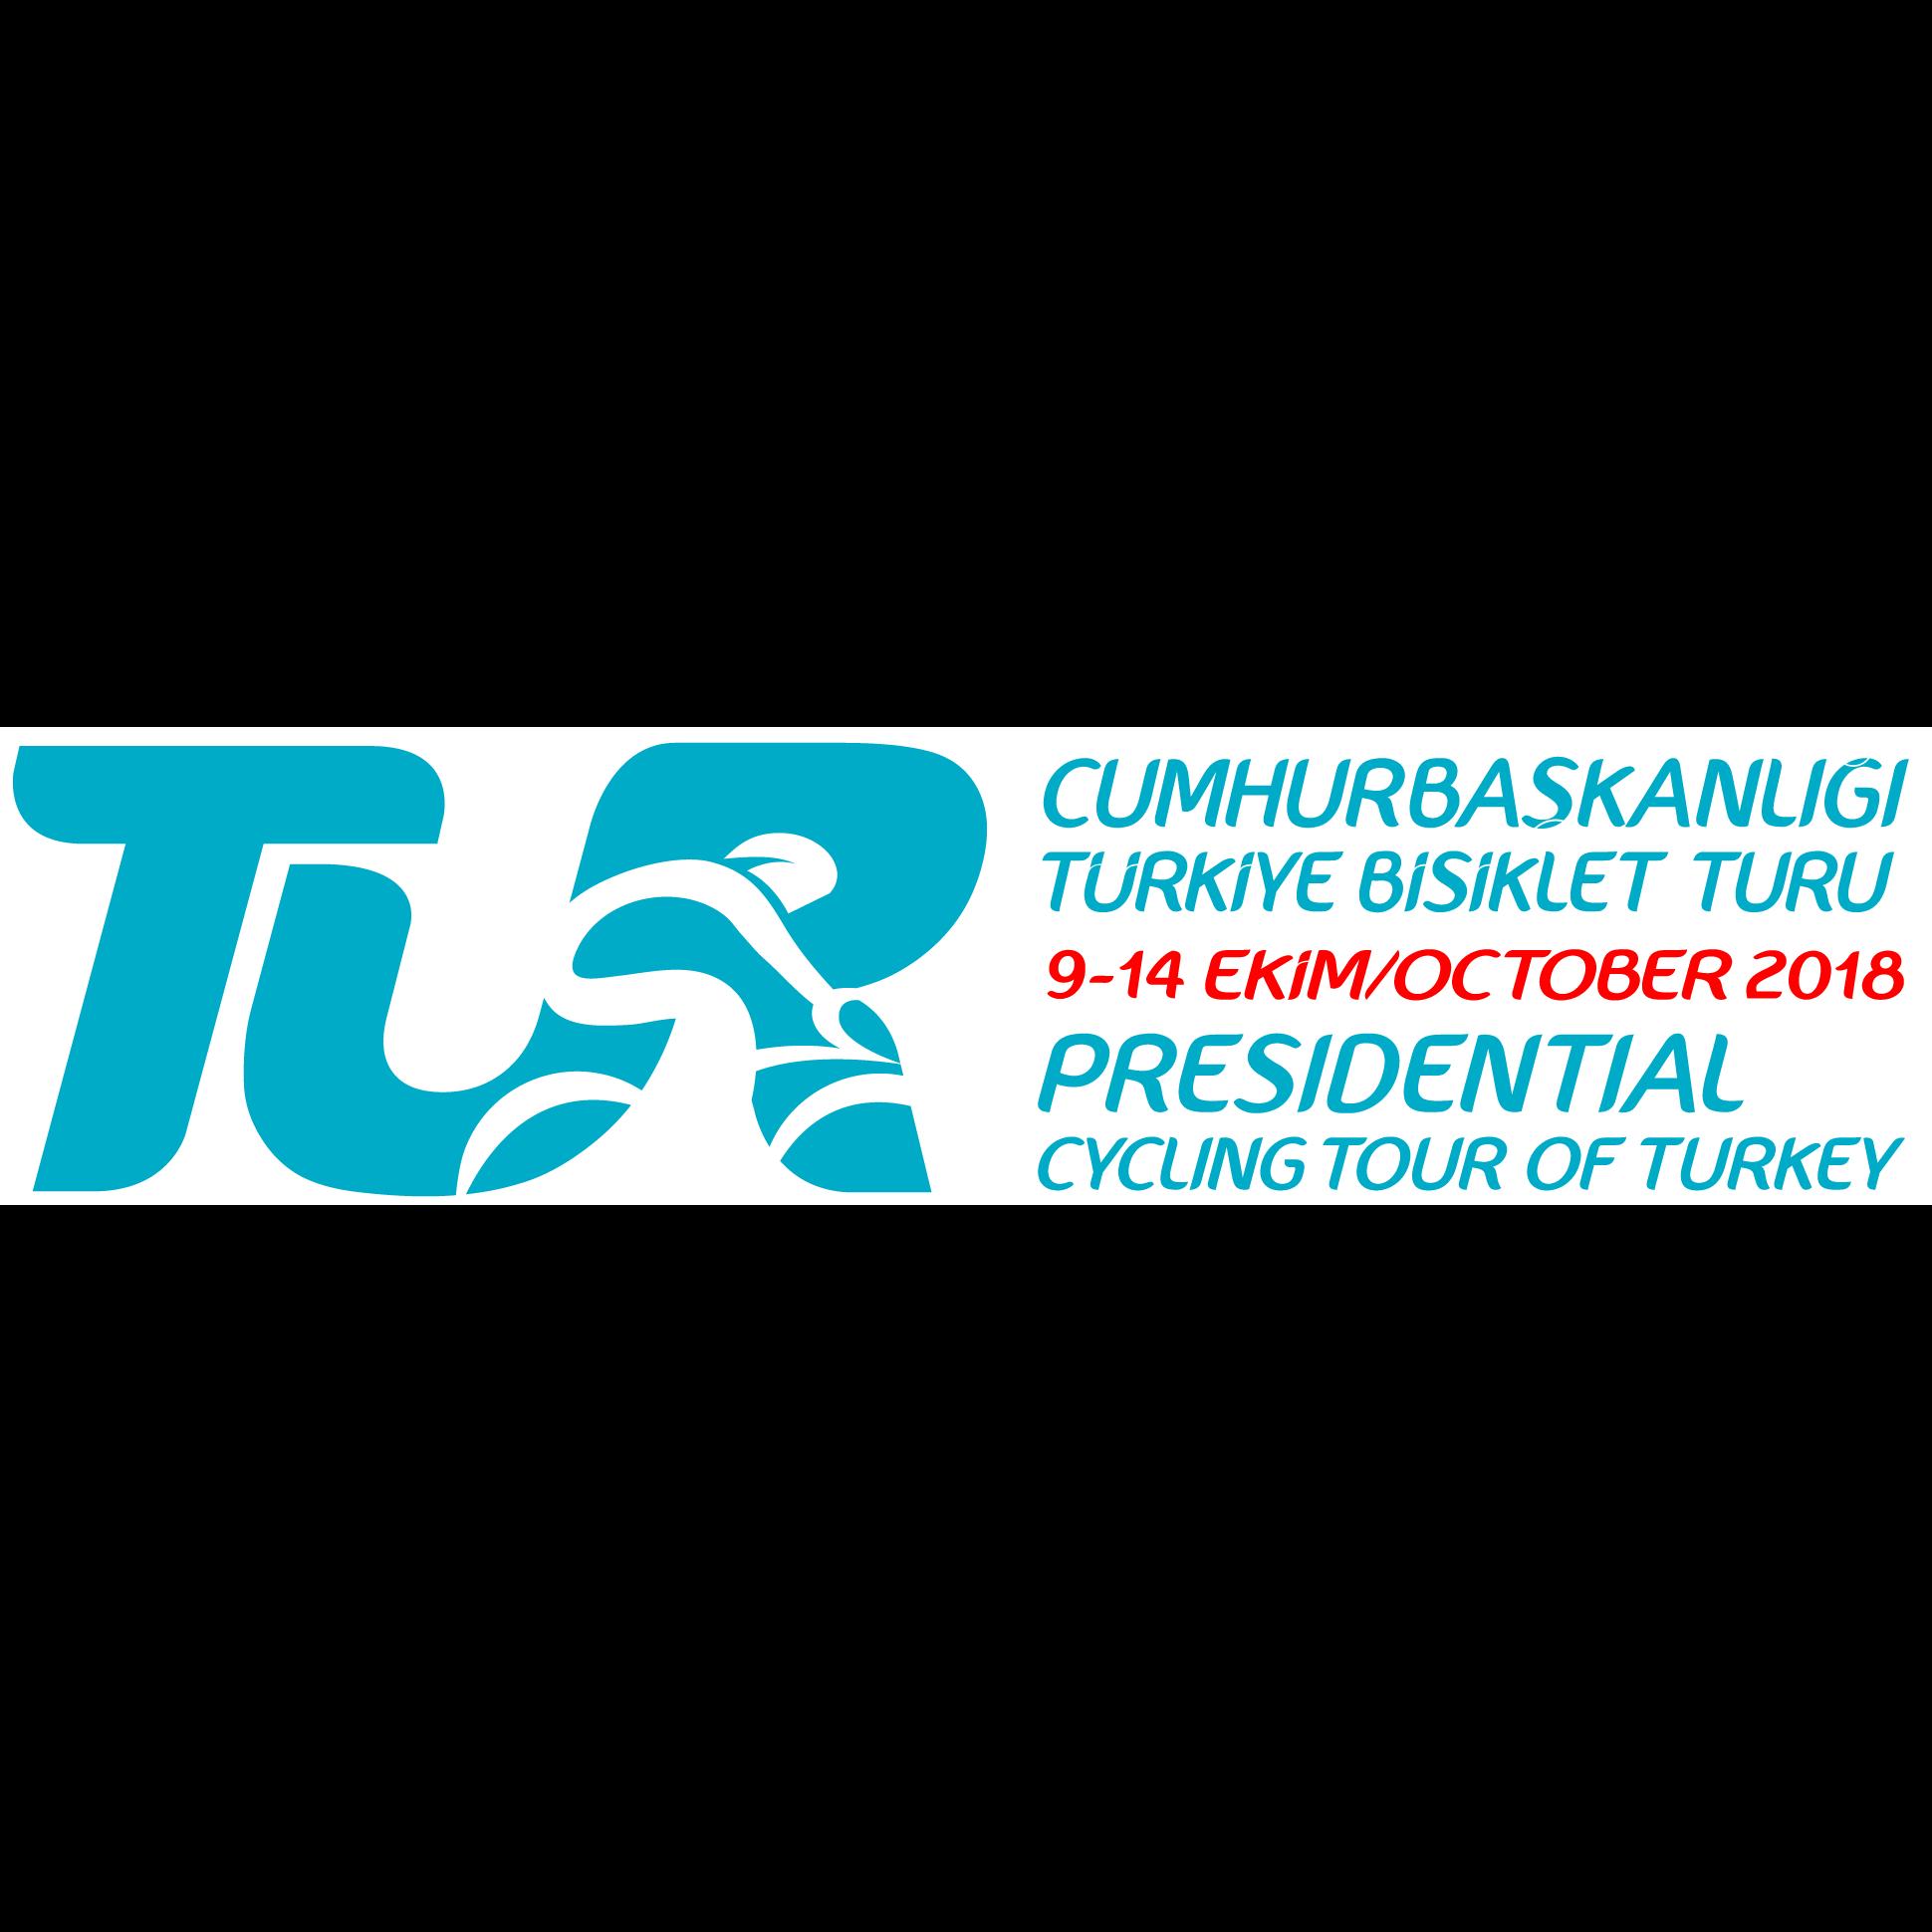 2018 UCI Cycling World Tour - Tour of Turkey